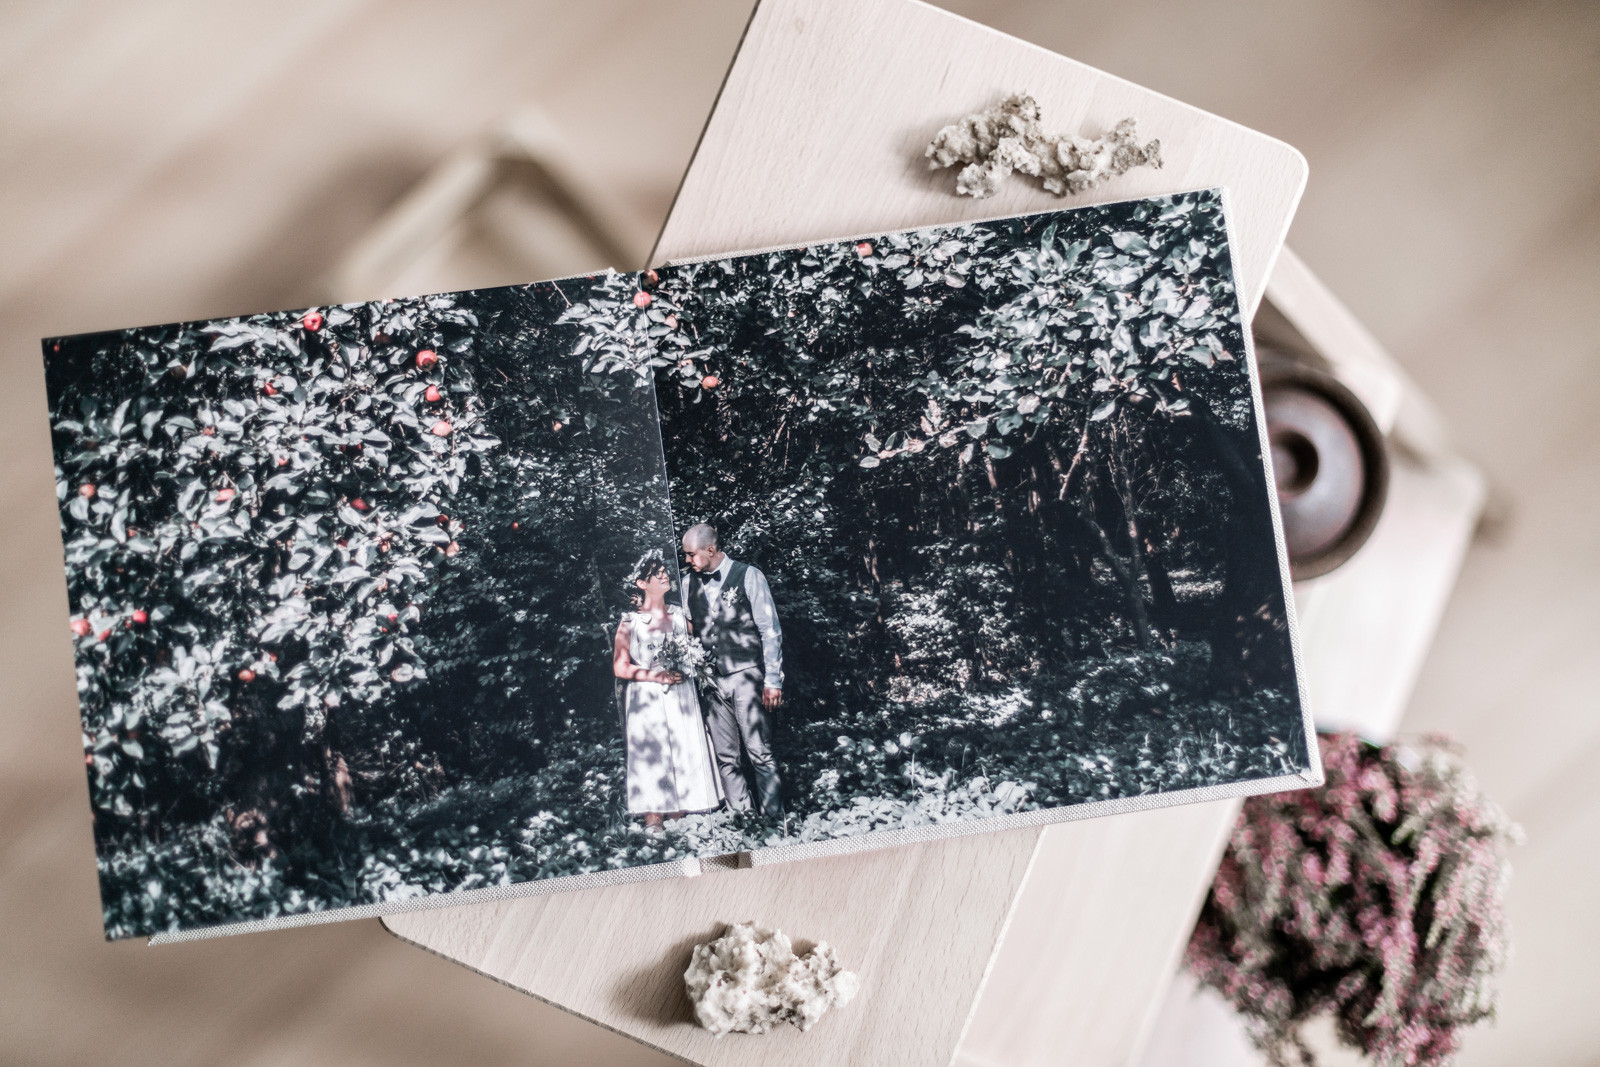 Darab_Zsuzsa_XYZ_weddings_book_001.jpg